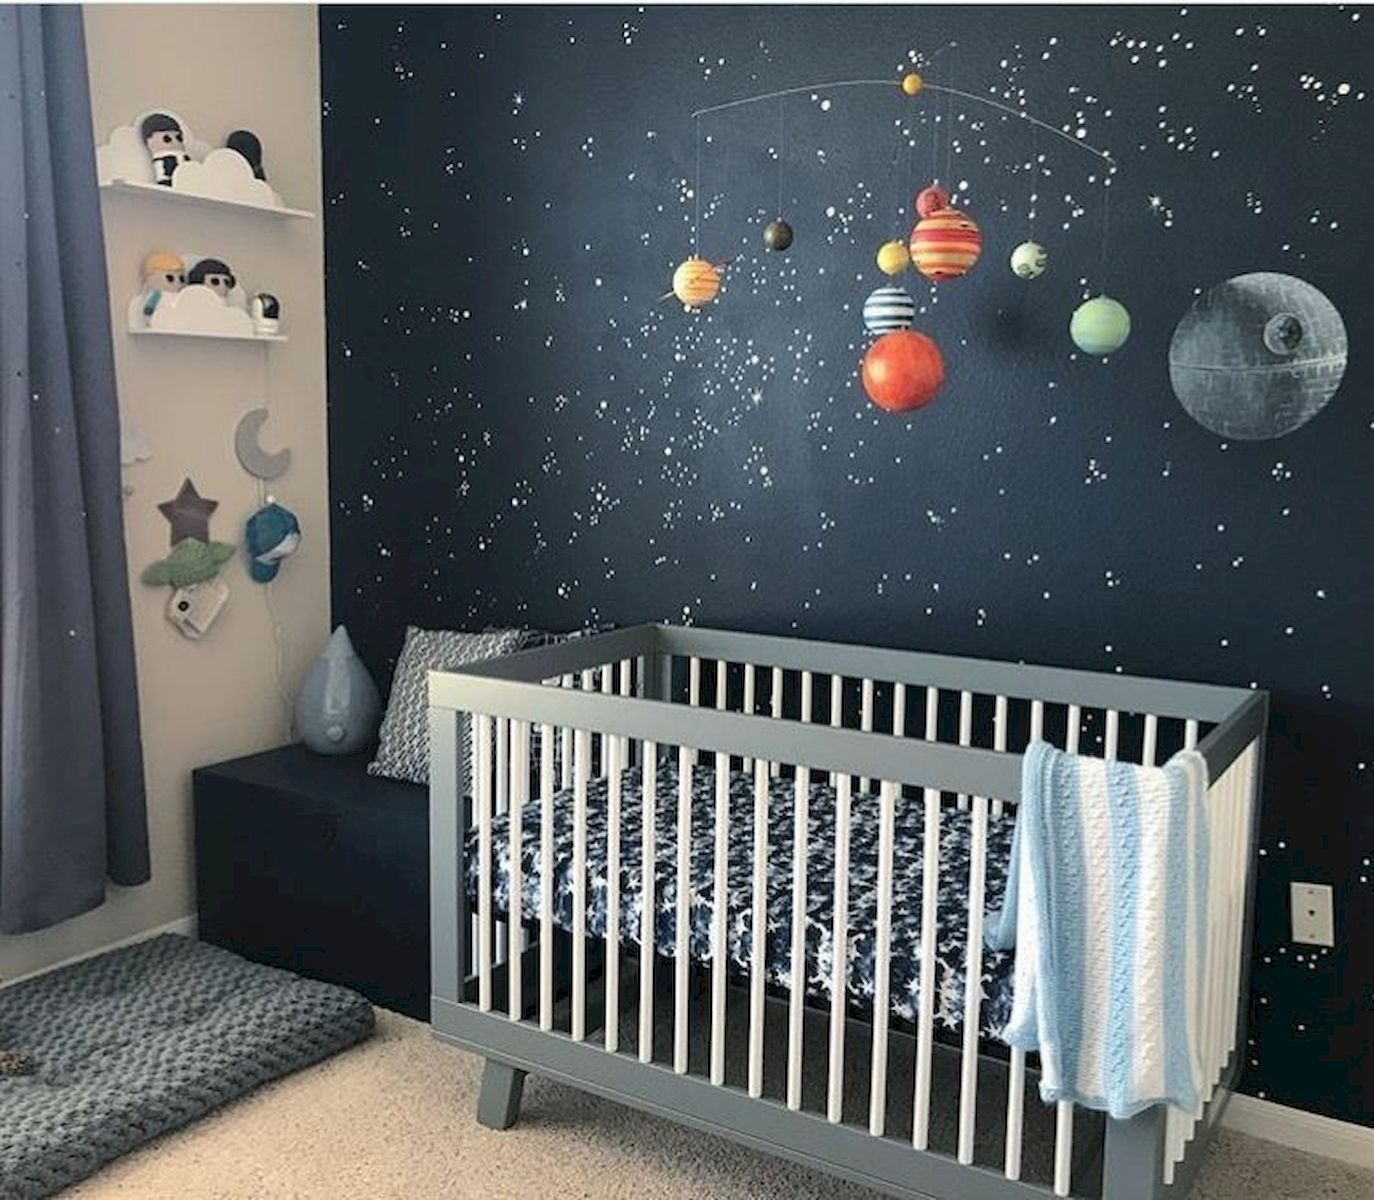 50 Cool Baby Nursery Ideas For Boys In 2020 Nursery Baby Room